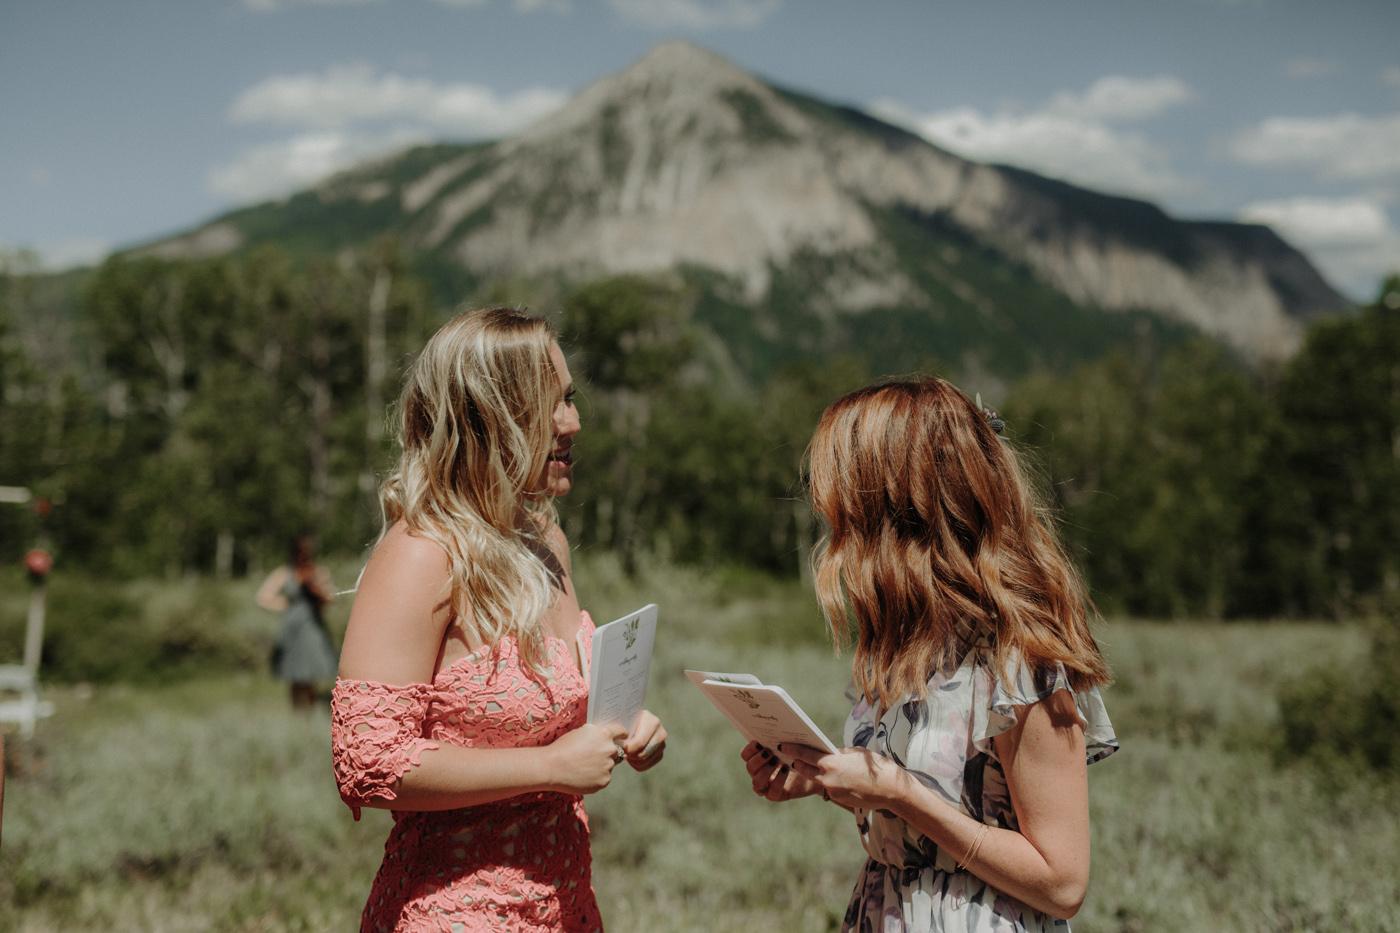 woods-walk-trail-crested-butte-colorado-wedding-21.jpg